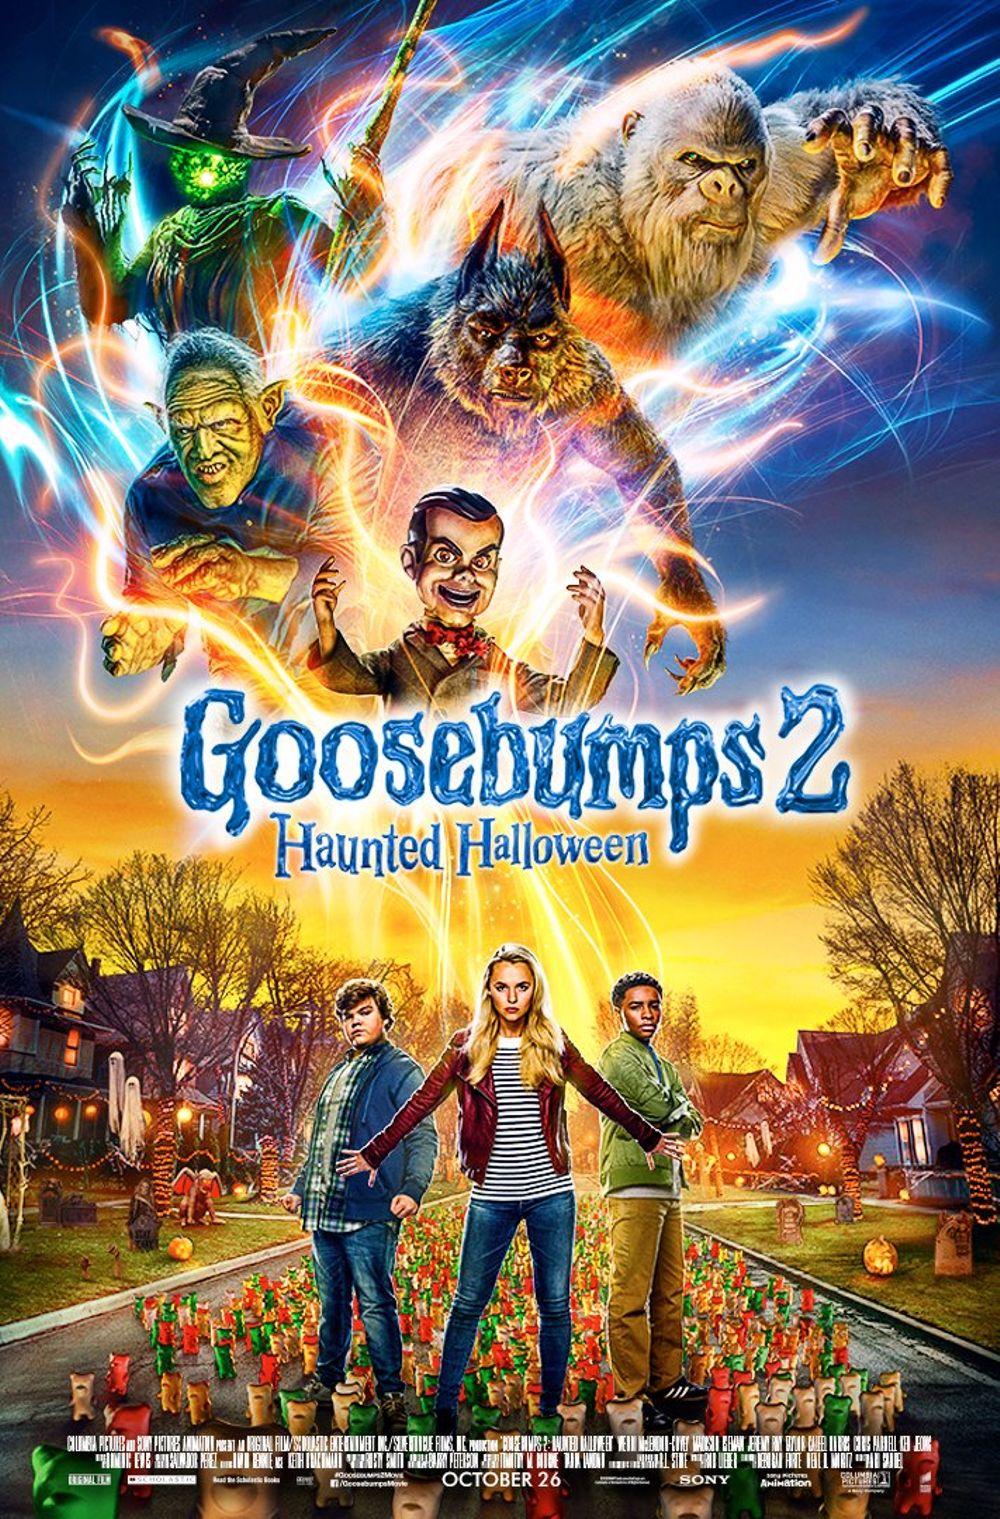 Goosebumps 2: Haunted Halloween Movie Review